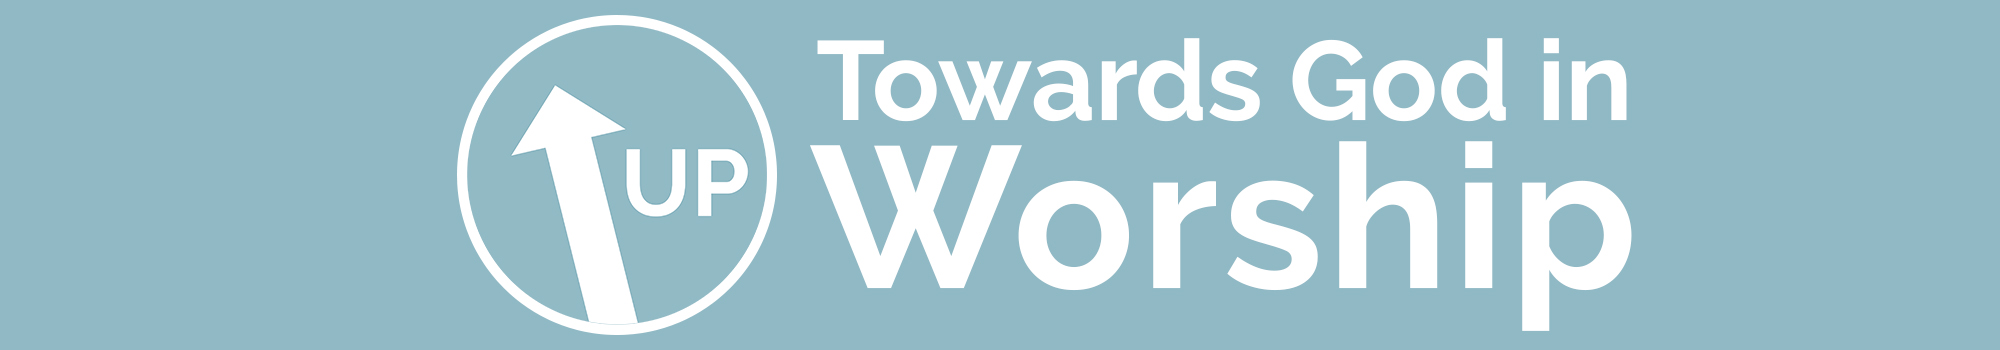 Up Towards God in Worship